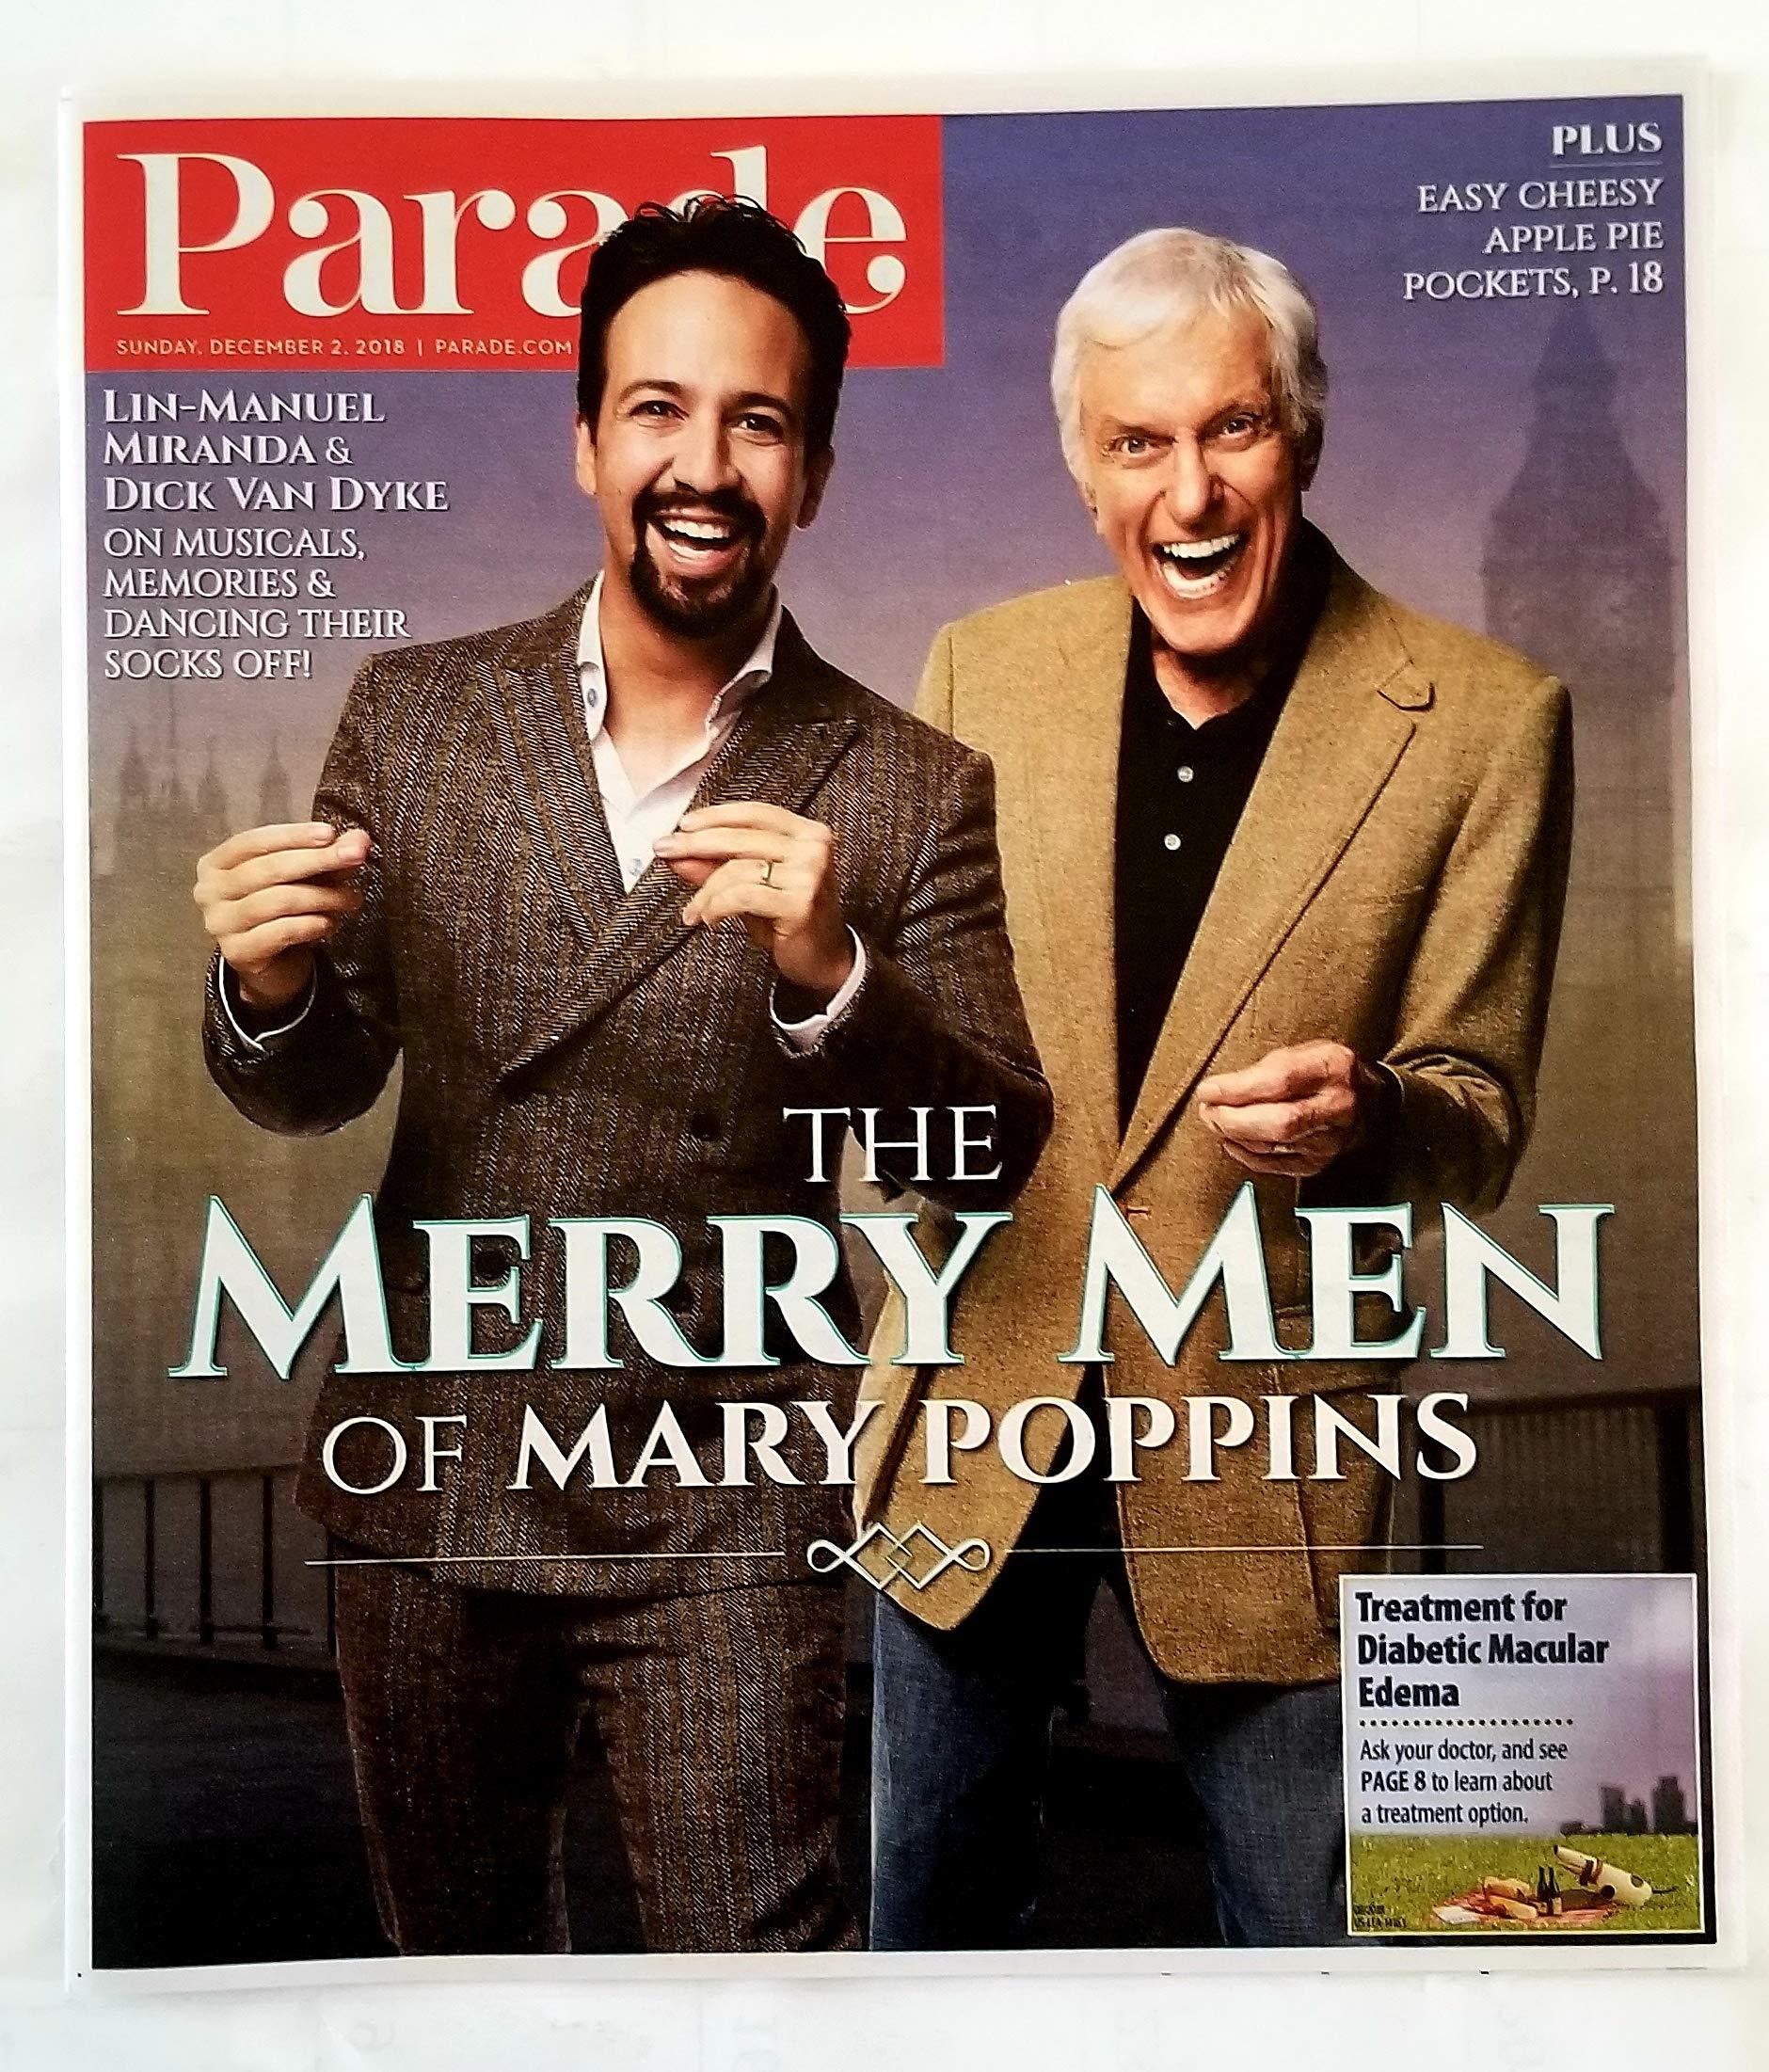 Parade Magazine - December 2, 2018 - The Merry Men of Mary